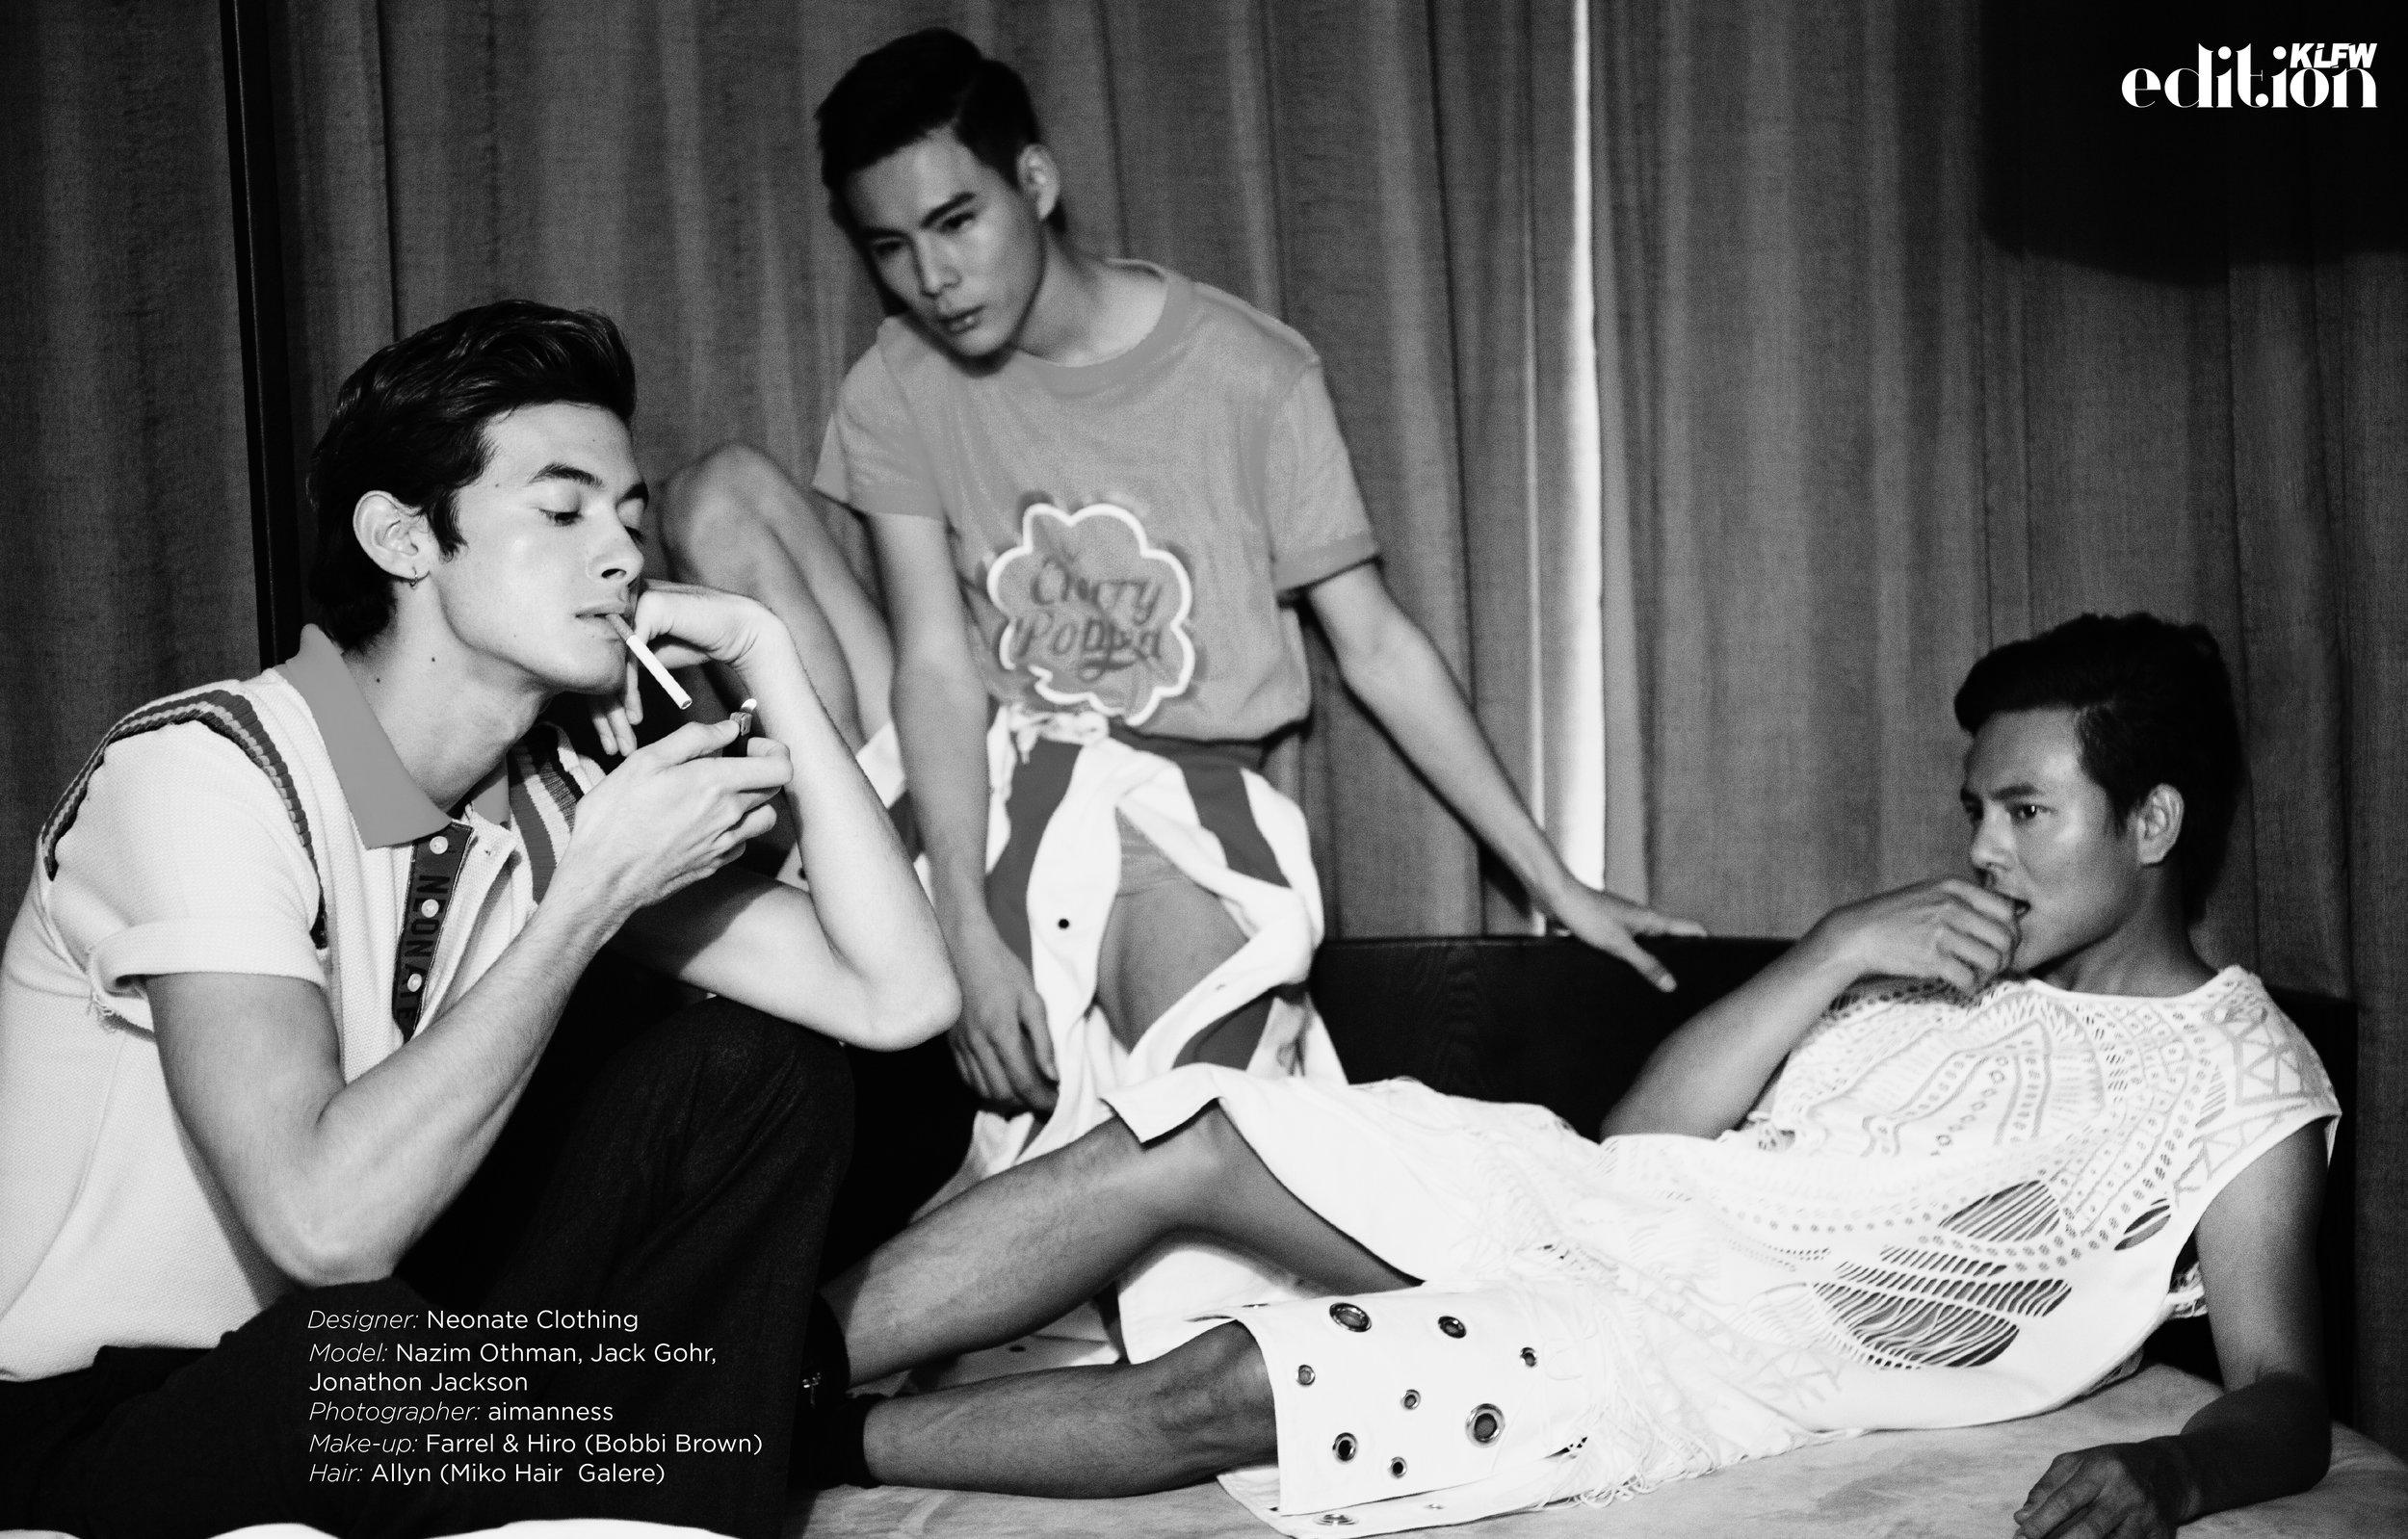 Designer:  Neonate Clothing  Model:  Nazim Othman  ,  Jack Gohr  ,  Jonathon Jackson  Photographer:  Aimanness   Make-up: Farrel & Hiro (  Bobbi Brown ) Hair: Allyn (  Miko Hair Galere  ) Location:  Mov Hotel